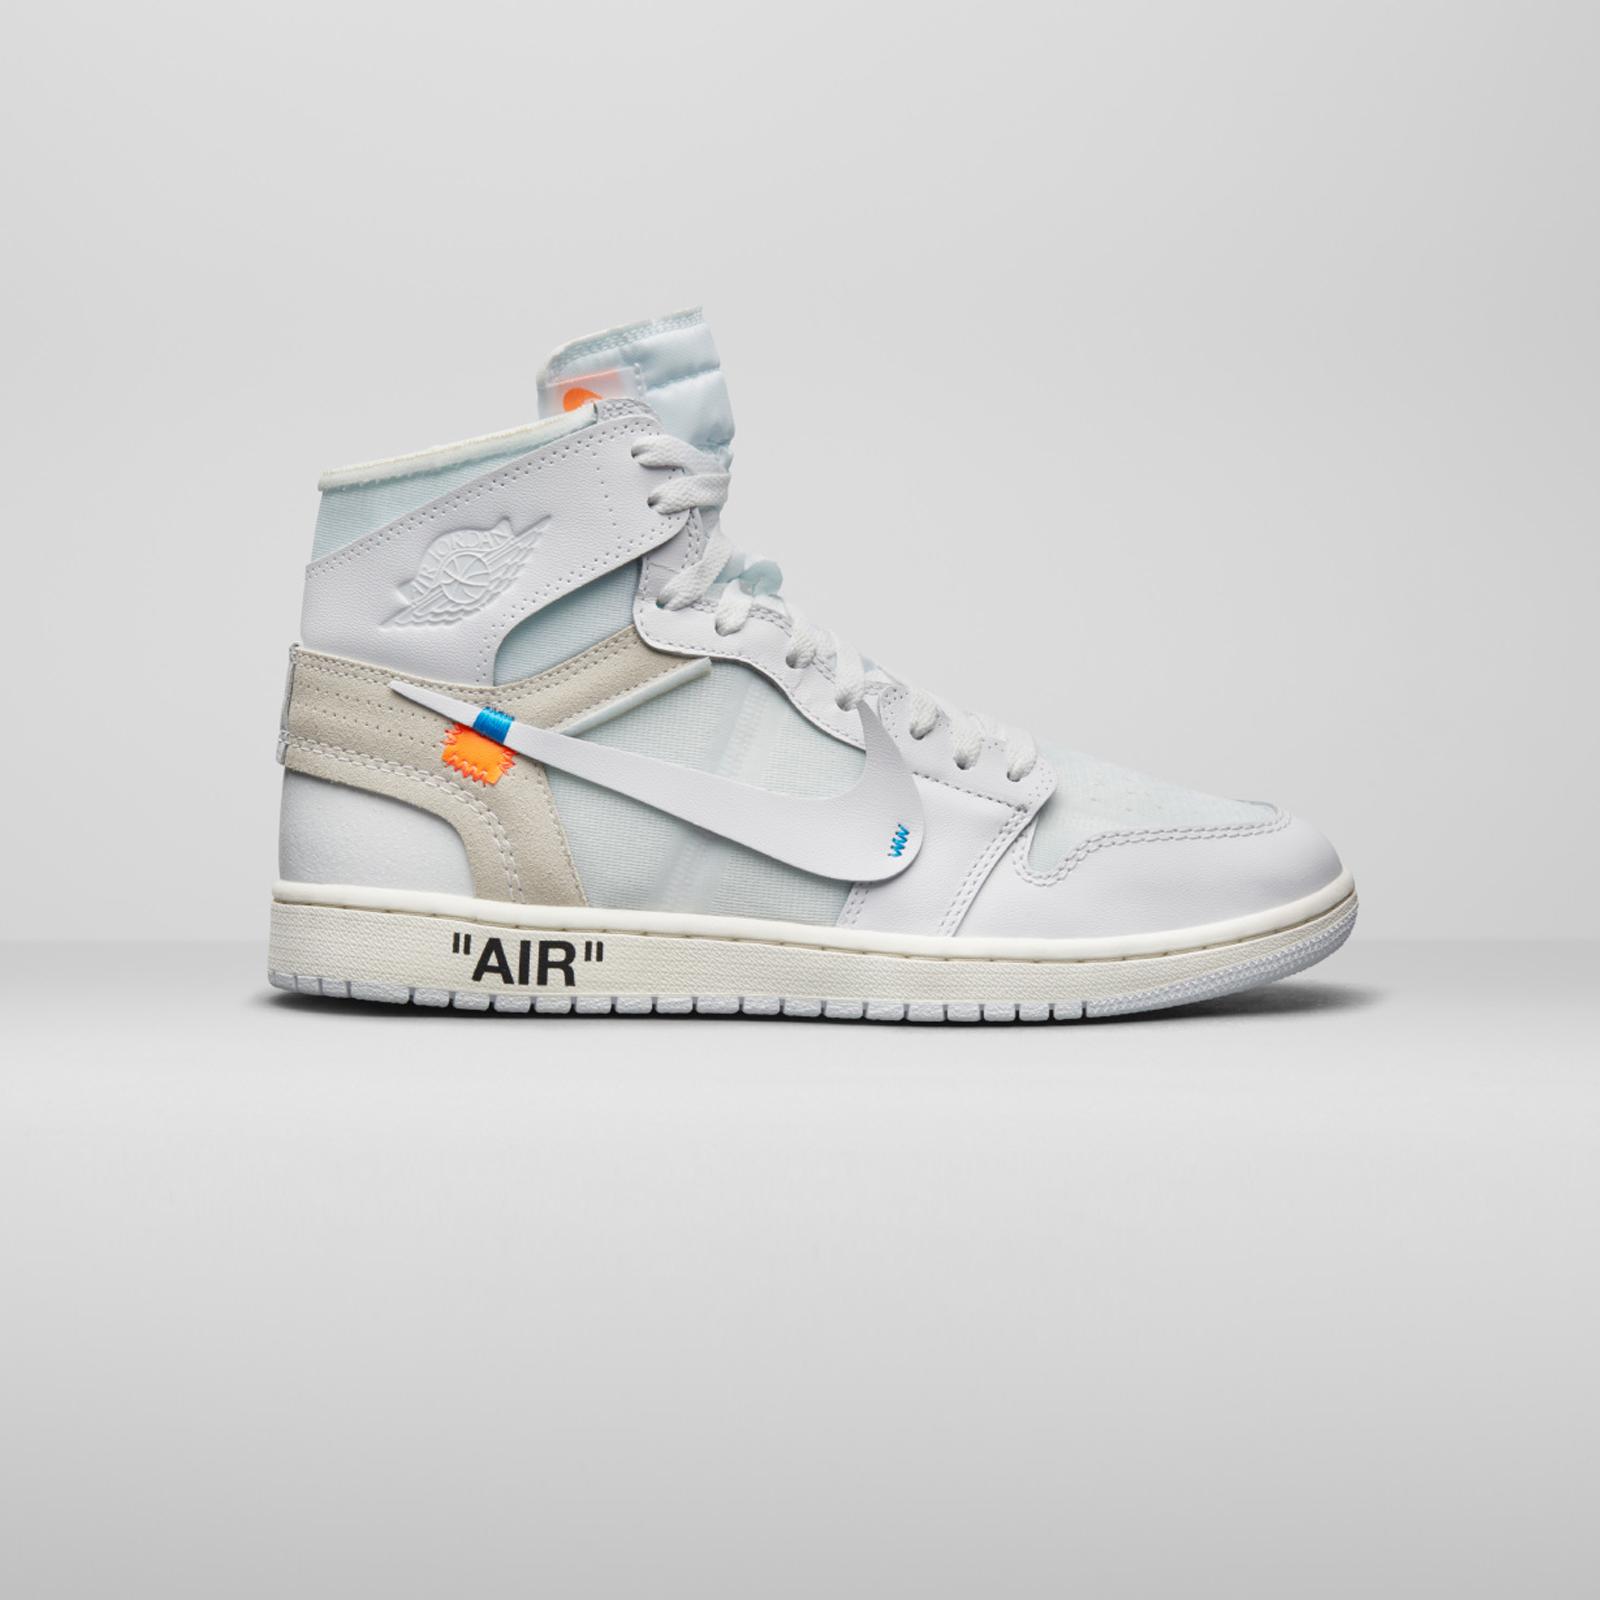 247ee8395e7833 Jordan Brand Air Jordan 1 x OFF-WHITE NRG (GS) - Aq8296-100 ...